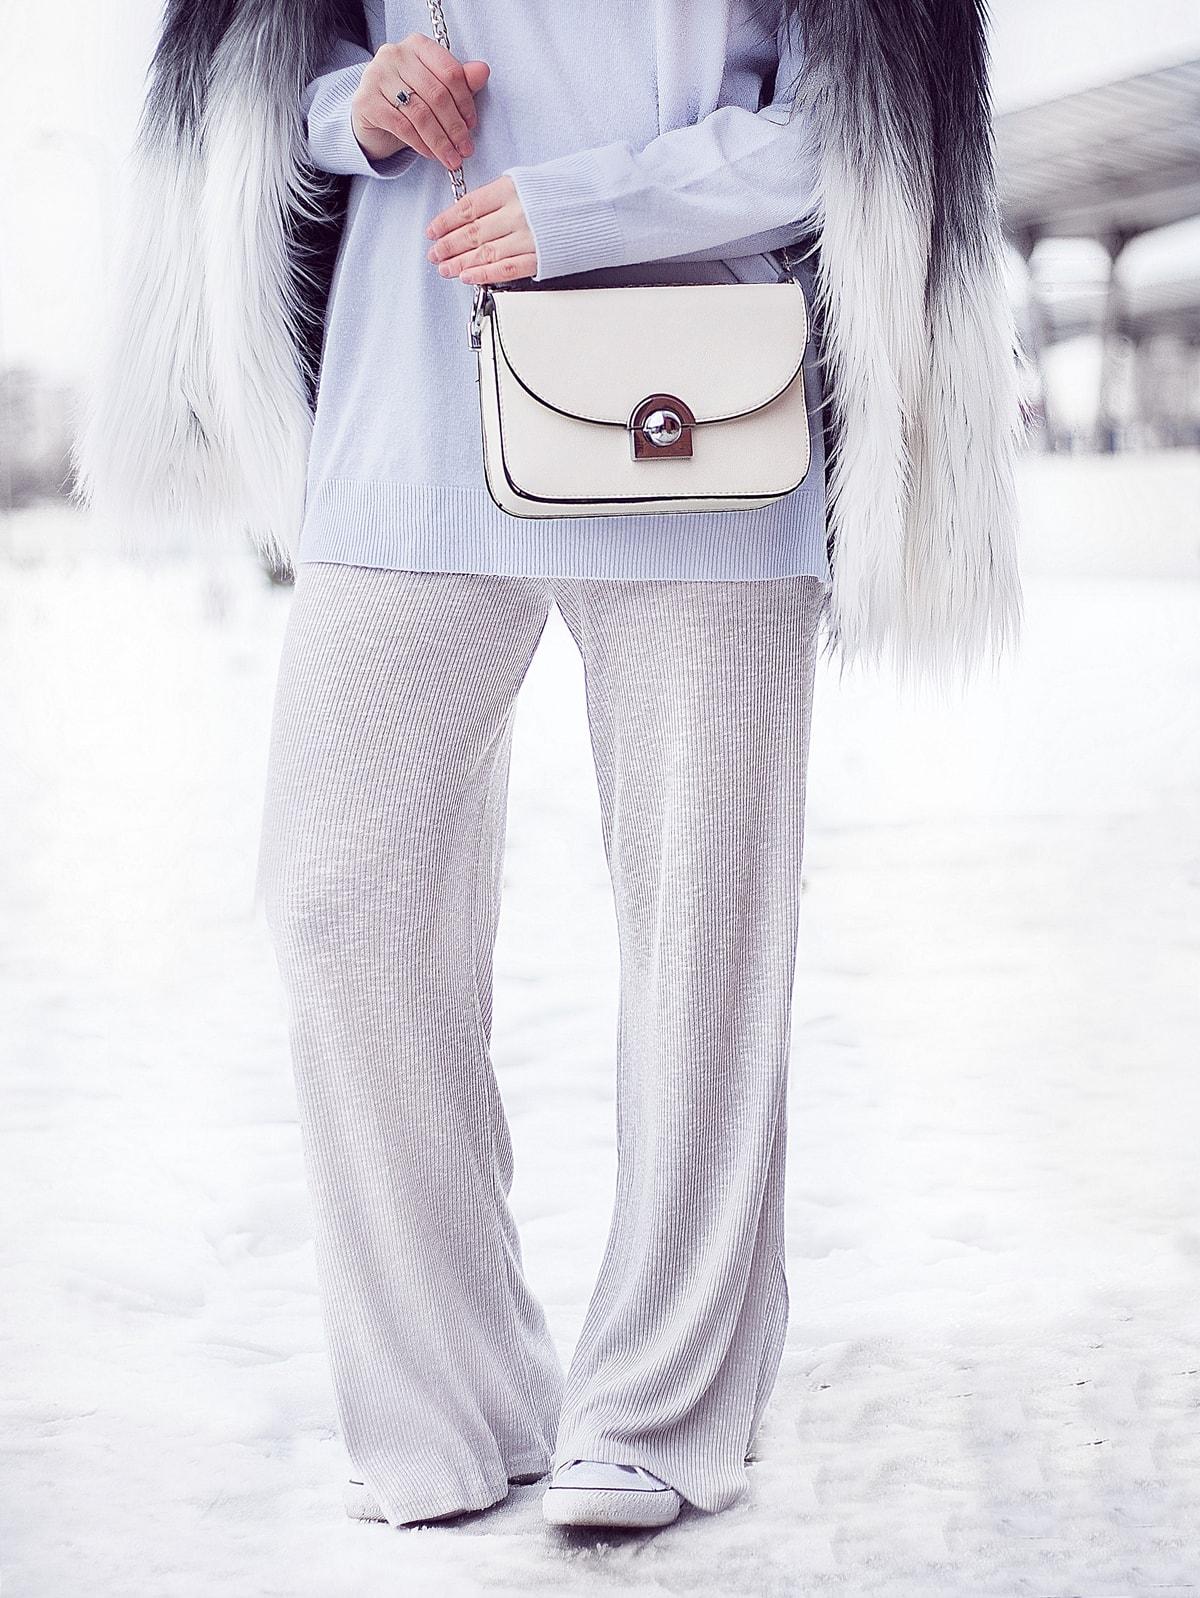 Pantaloni din tricot, gri, pull and bear, 2017, iarna, tinuta, blogger